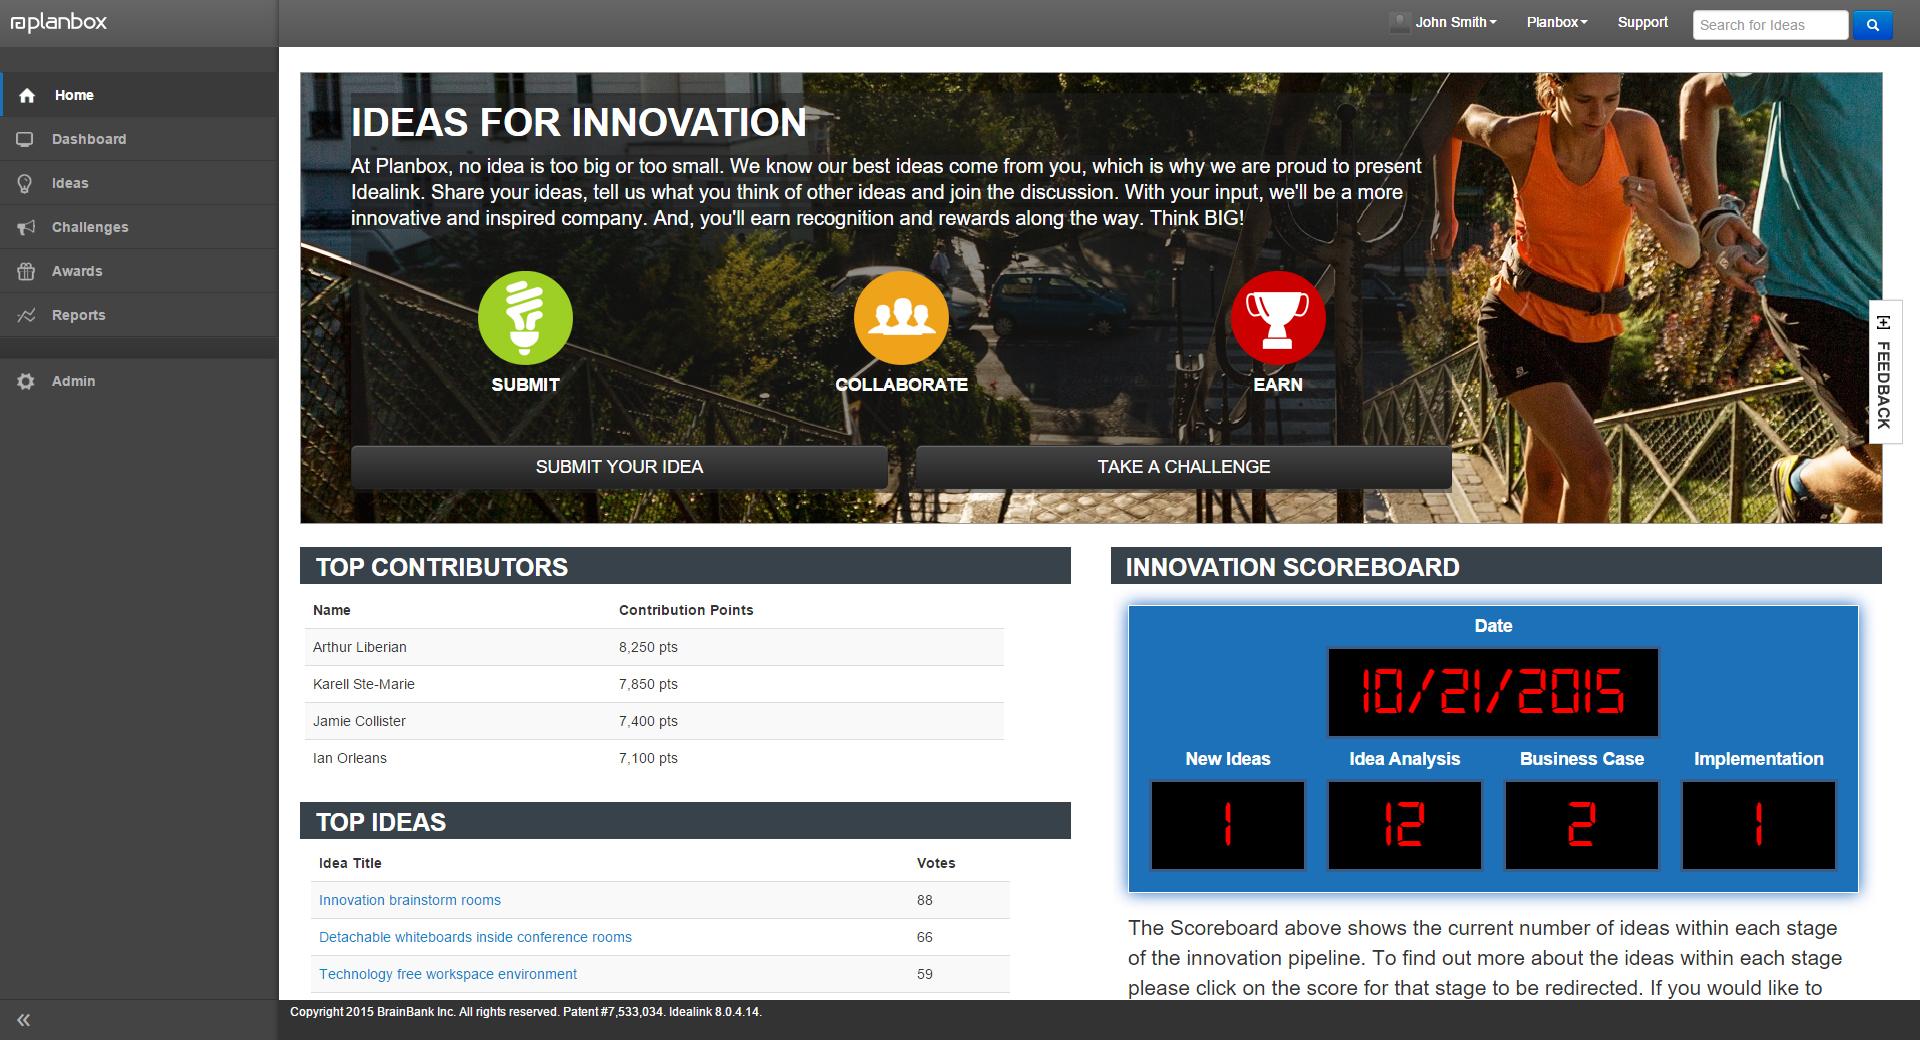 Planbox Innovate screenshot: Planbox Innovate innovation and feedback portal